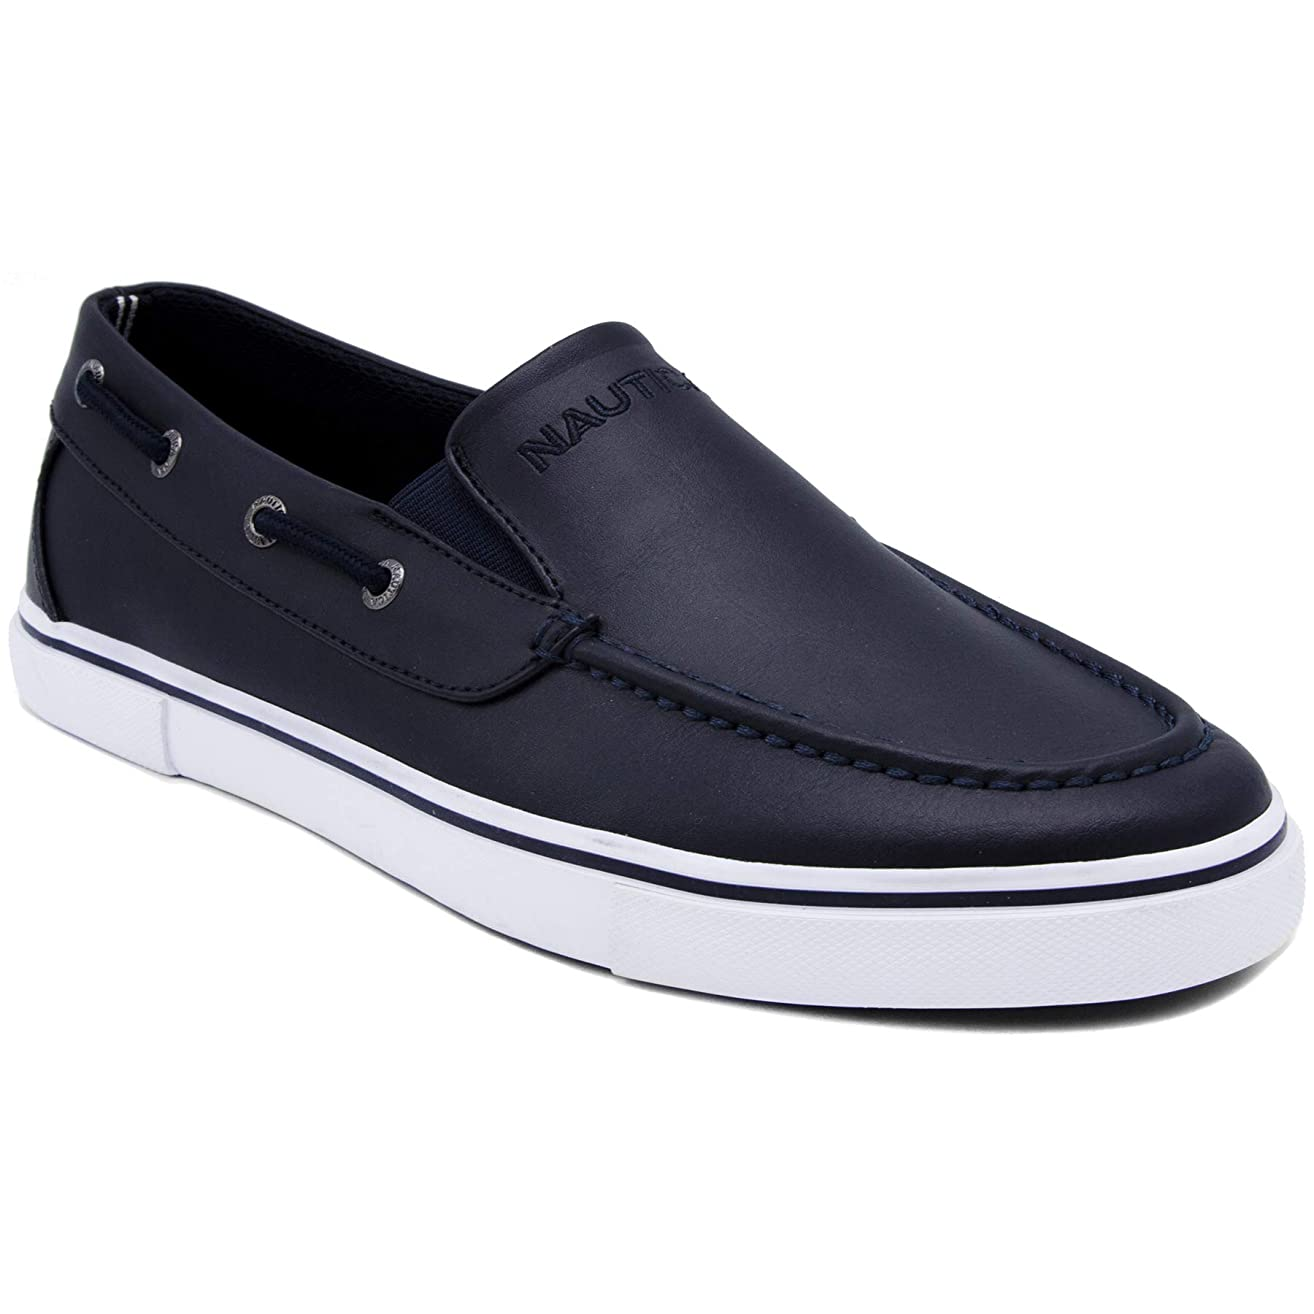 Nautica Men's Doubloon Boat Shoe Slip-On Loafer